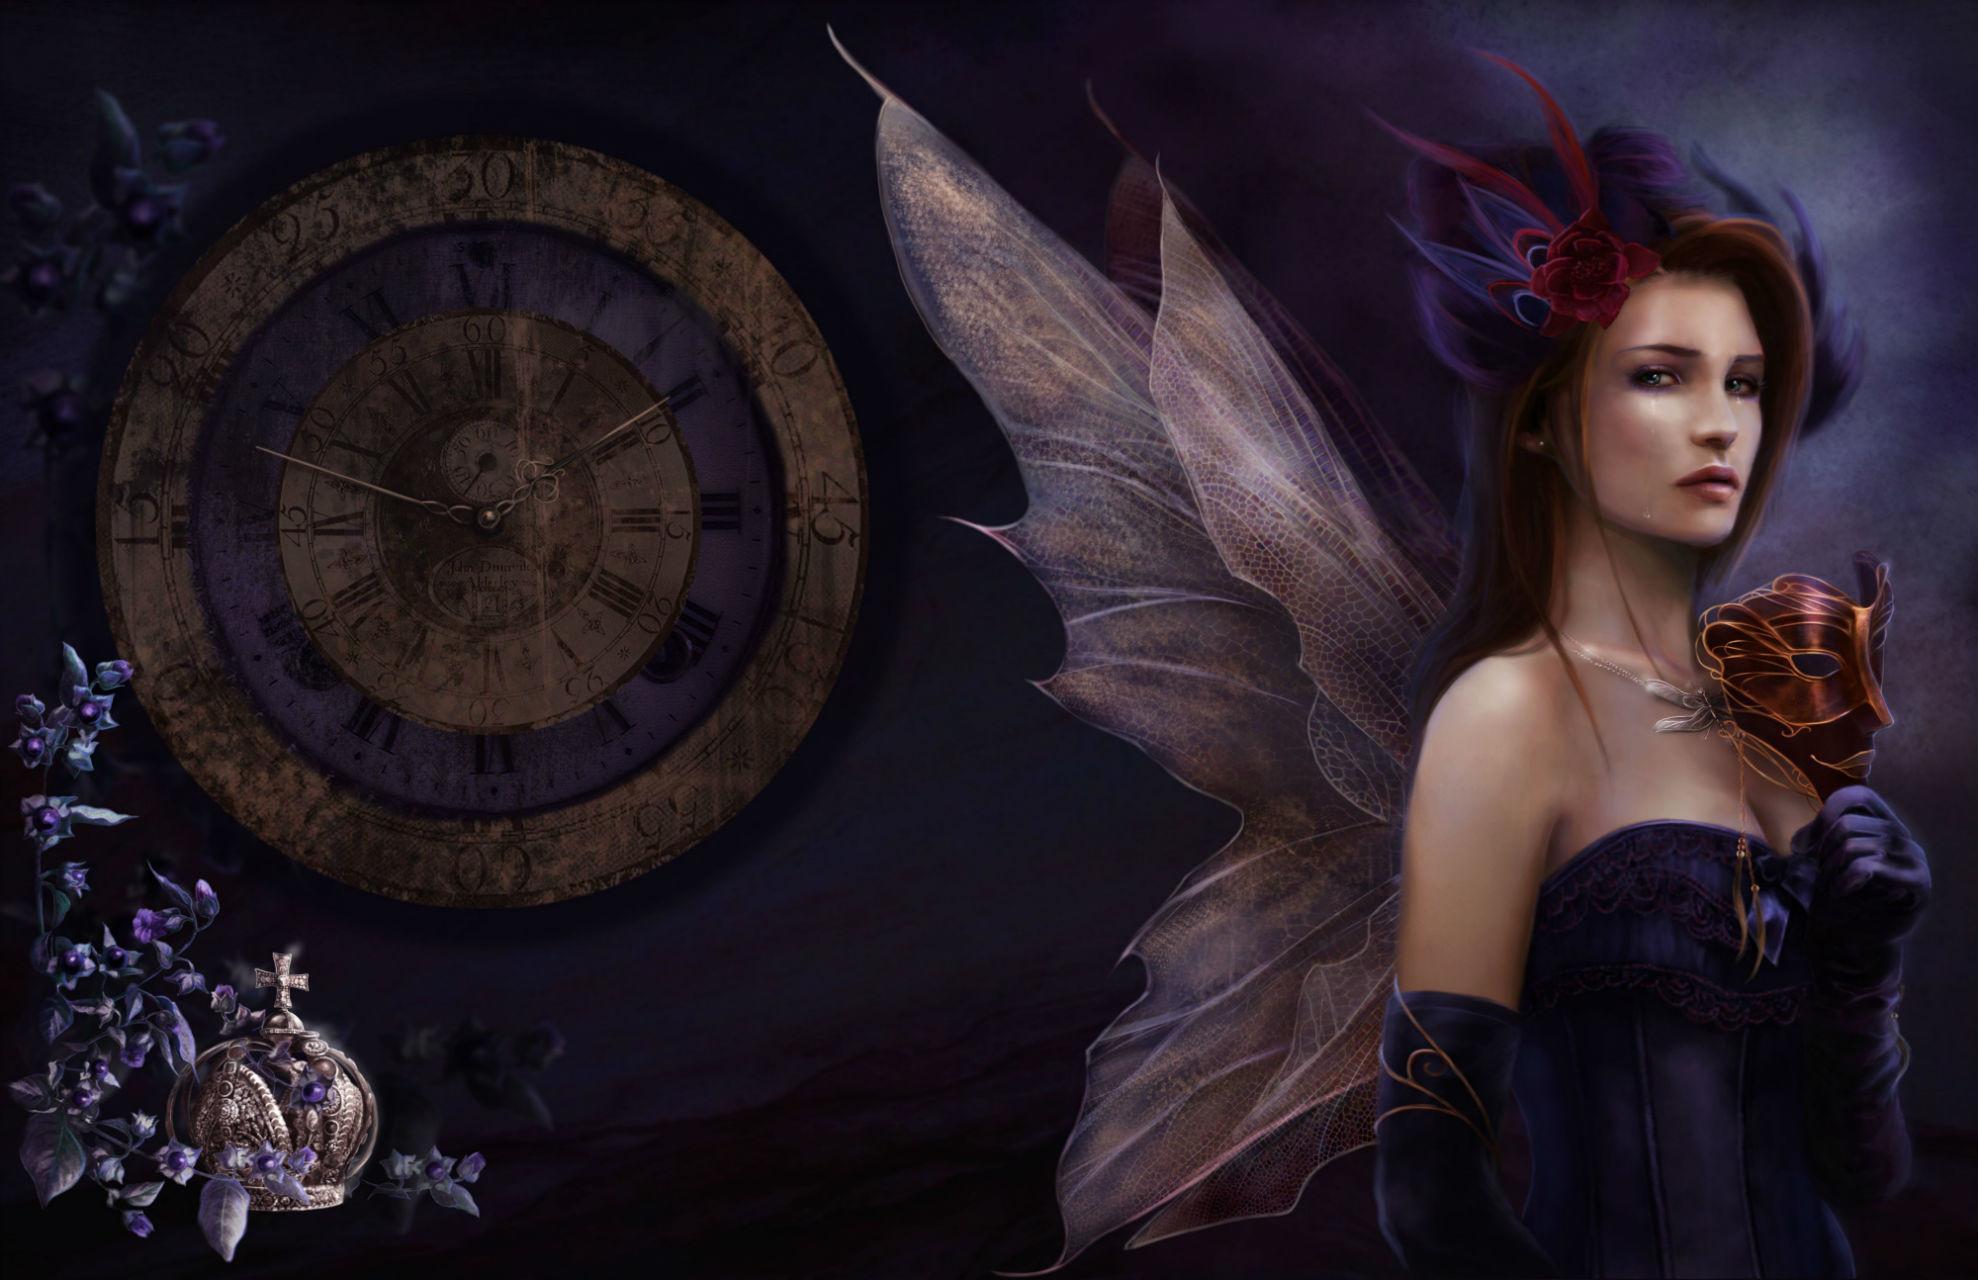 fantasy gothic fairy time women art wallpaper background